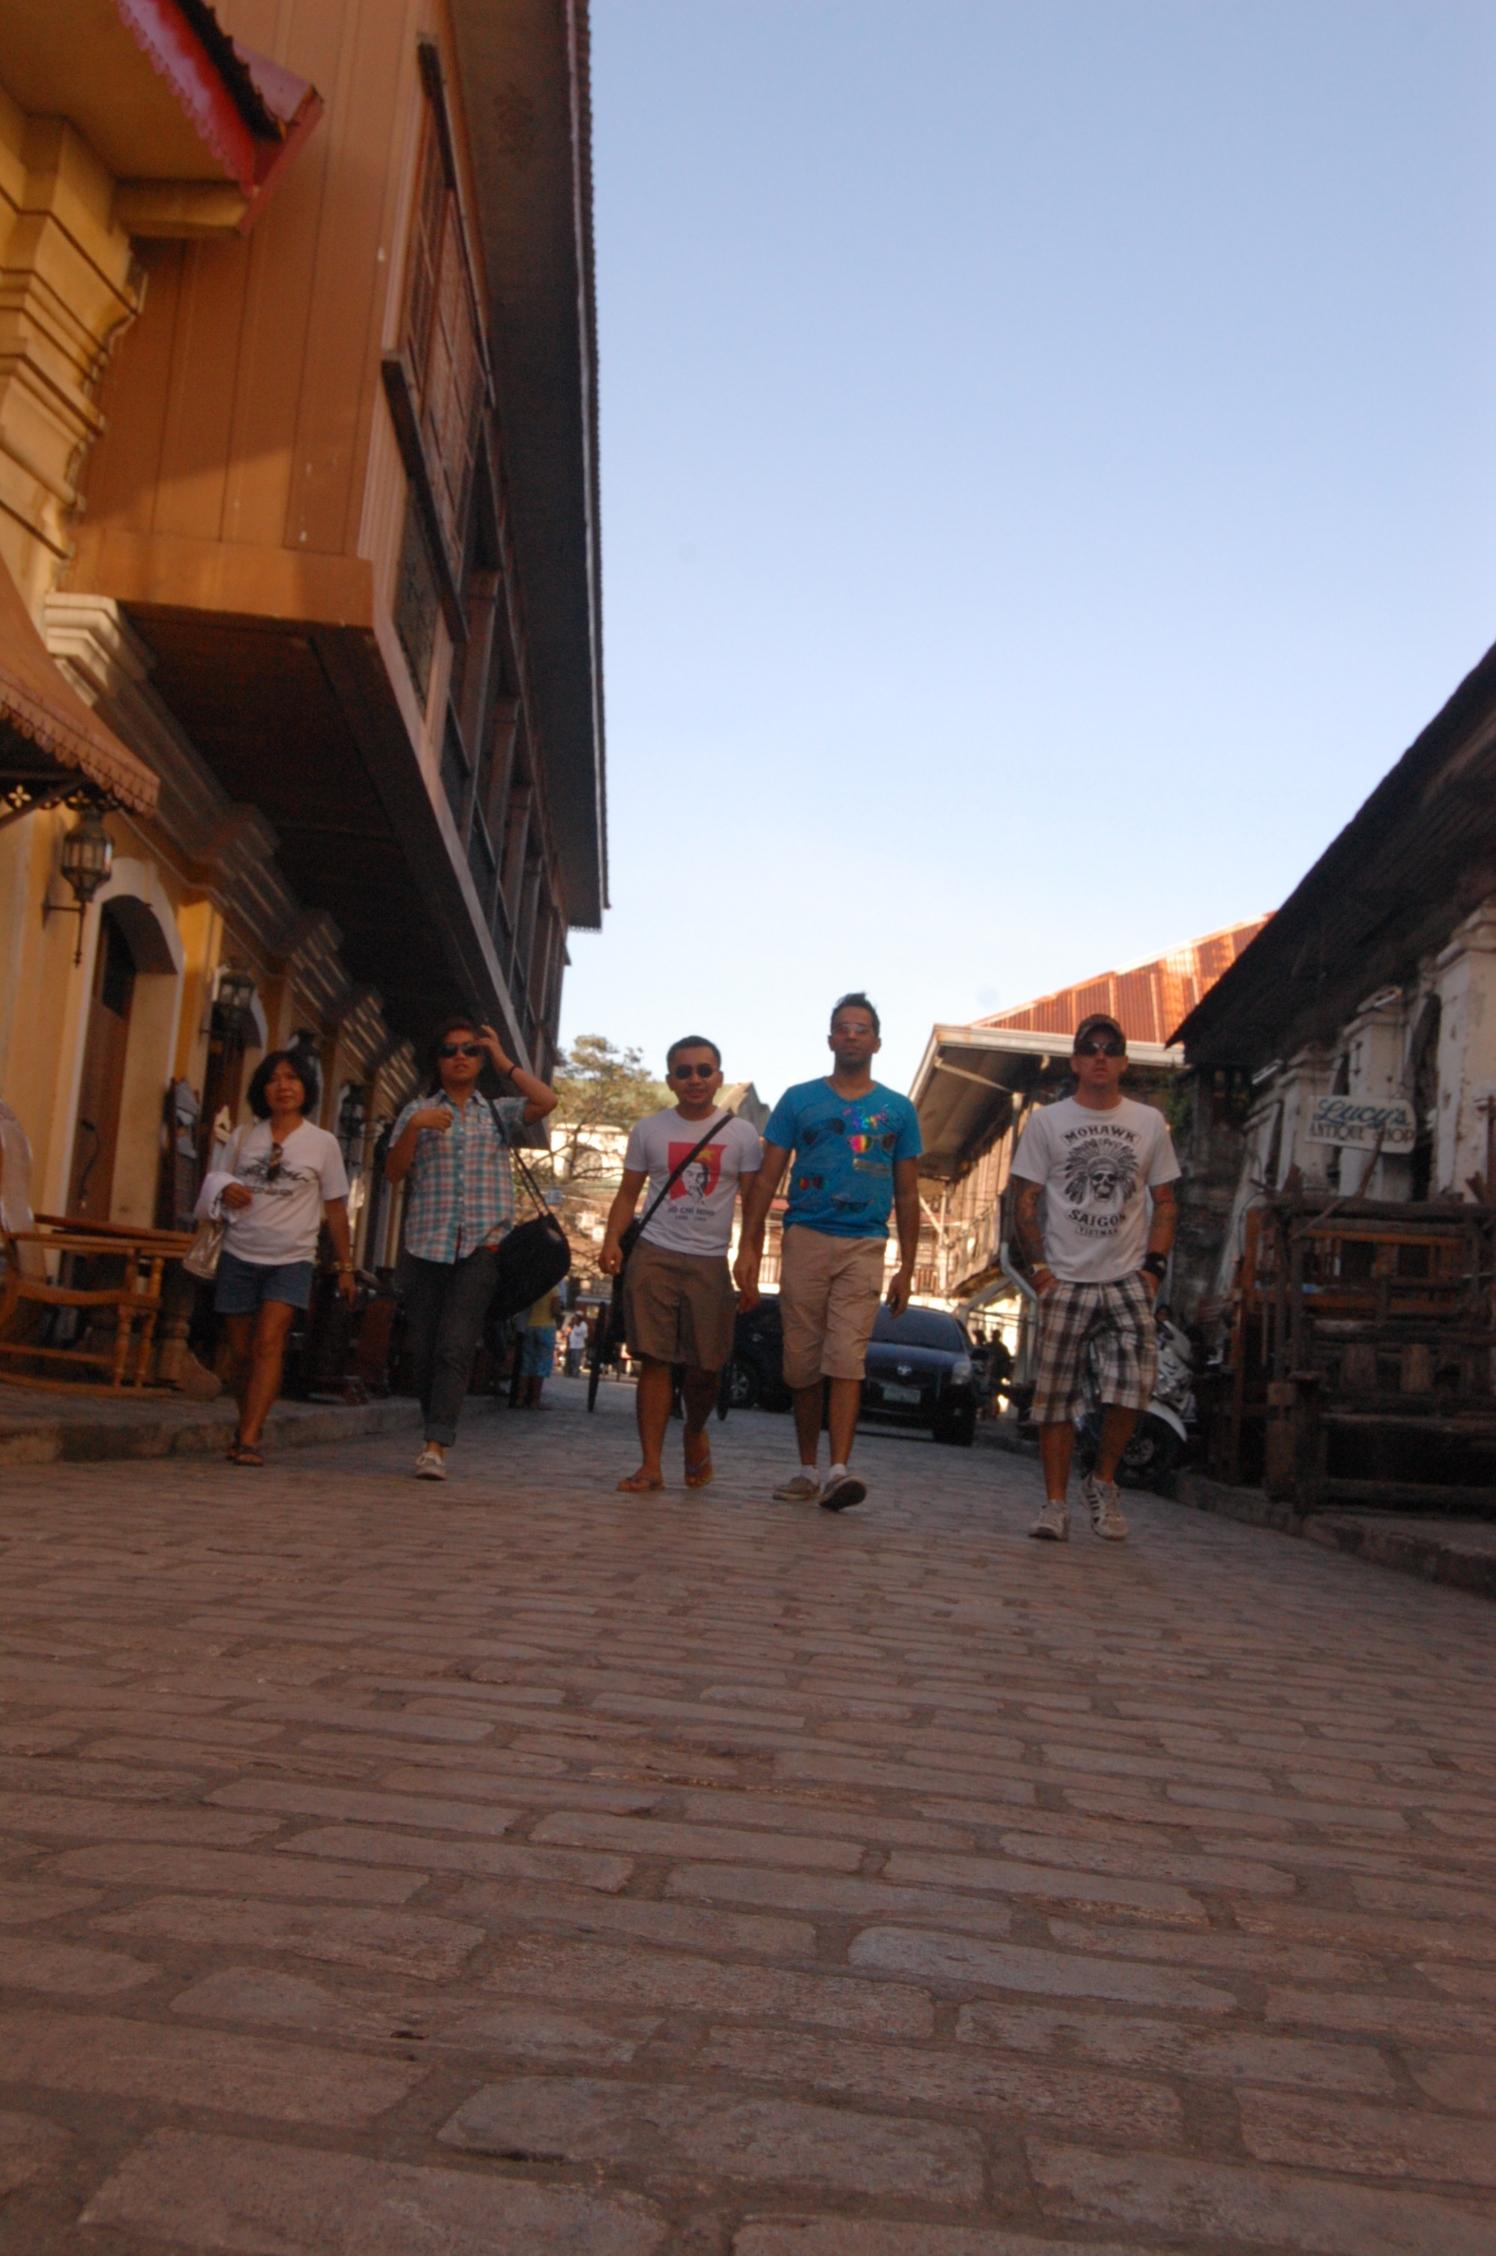 I Made Spain Visit Vigan! Historic Town of Vigan - Philippines By Bernard Joseph Esposo Guerrero